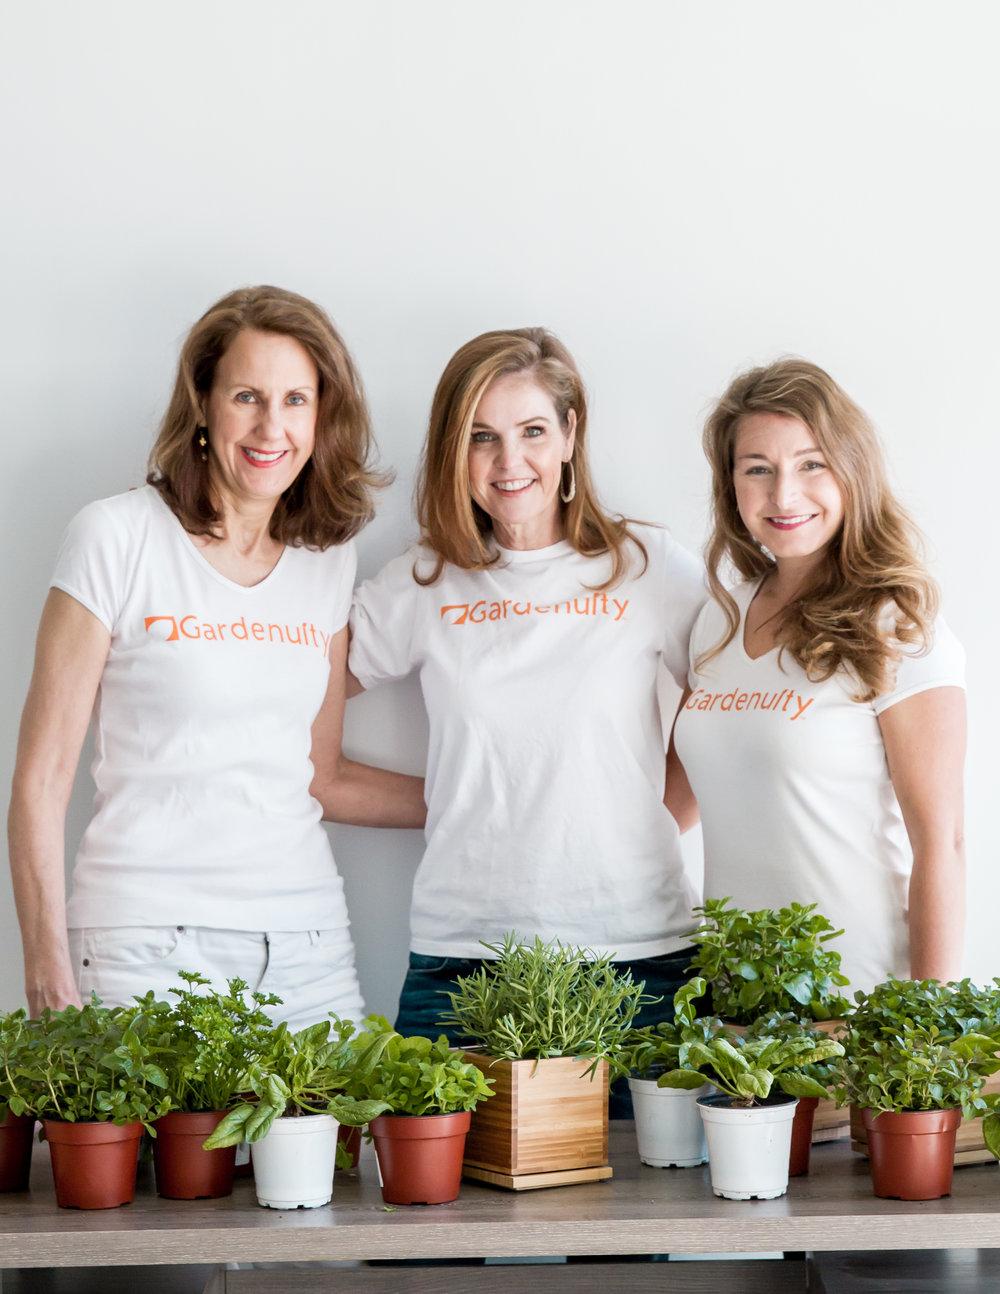 Julie Eggers, Donna Letier, Brie Arthur_Gardenuity.jpg